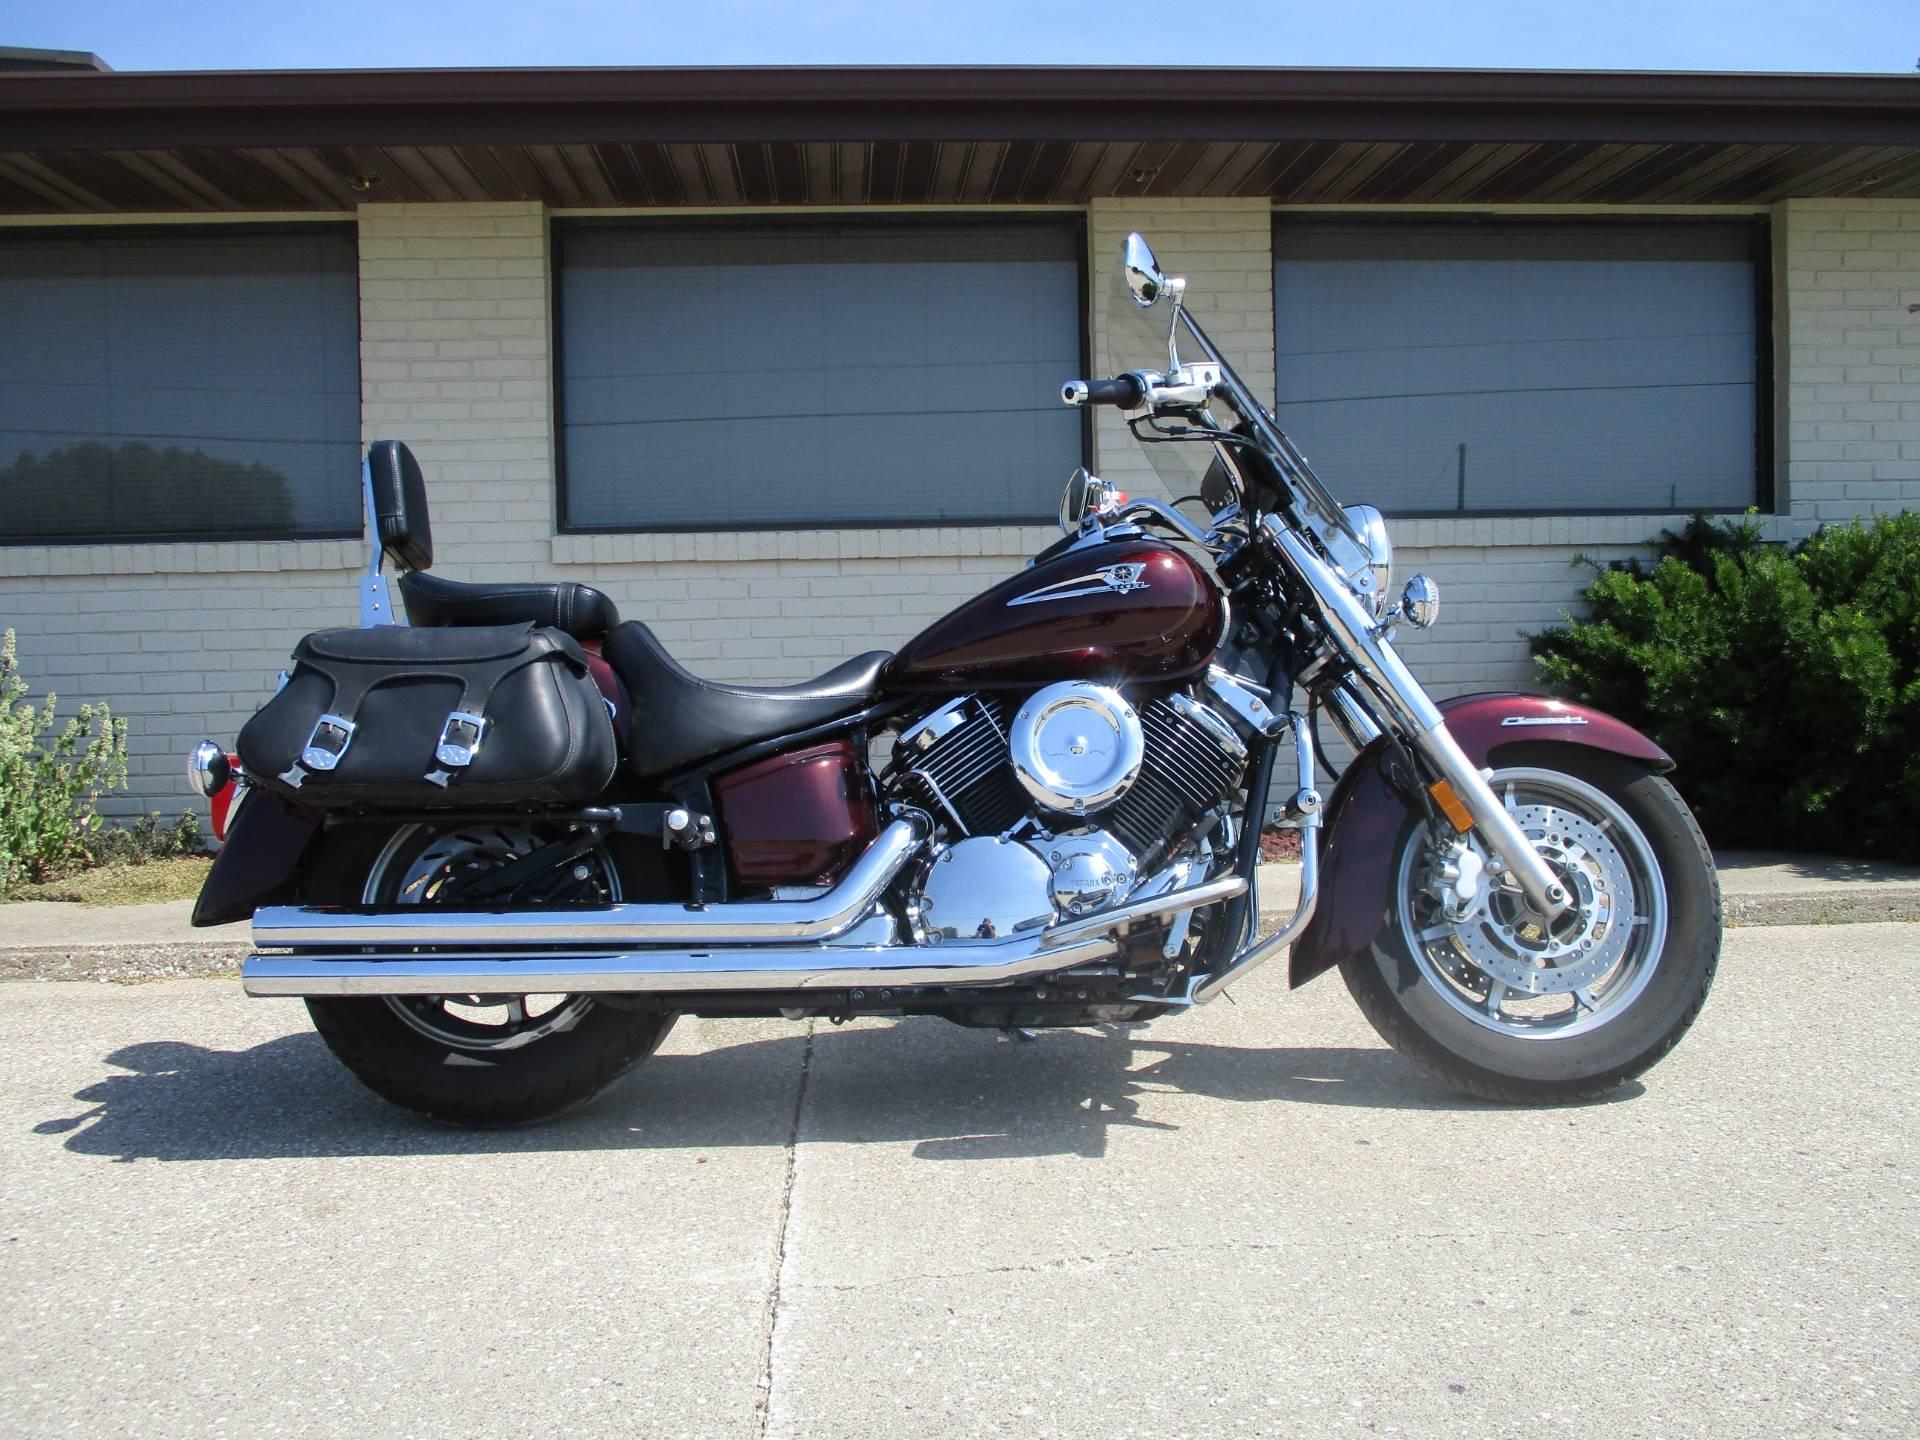 Used 2007 Yamaha V Star® 1100 Silverado® Motorcycles in Winterset ...